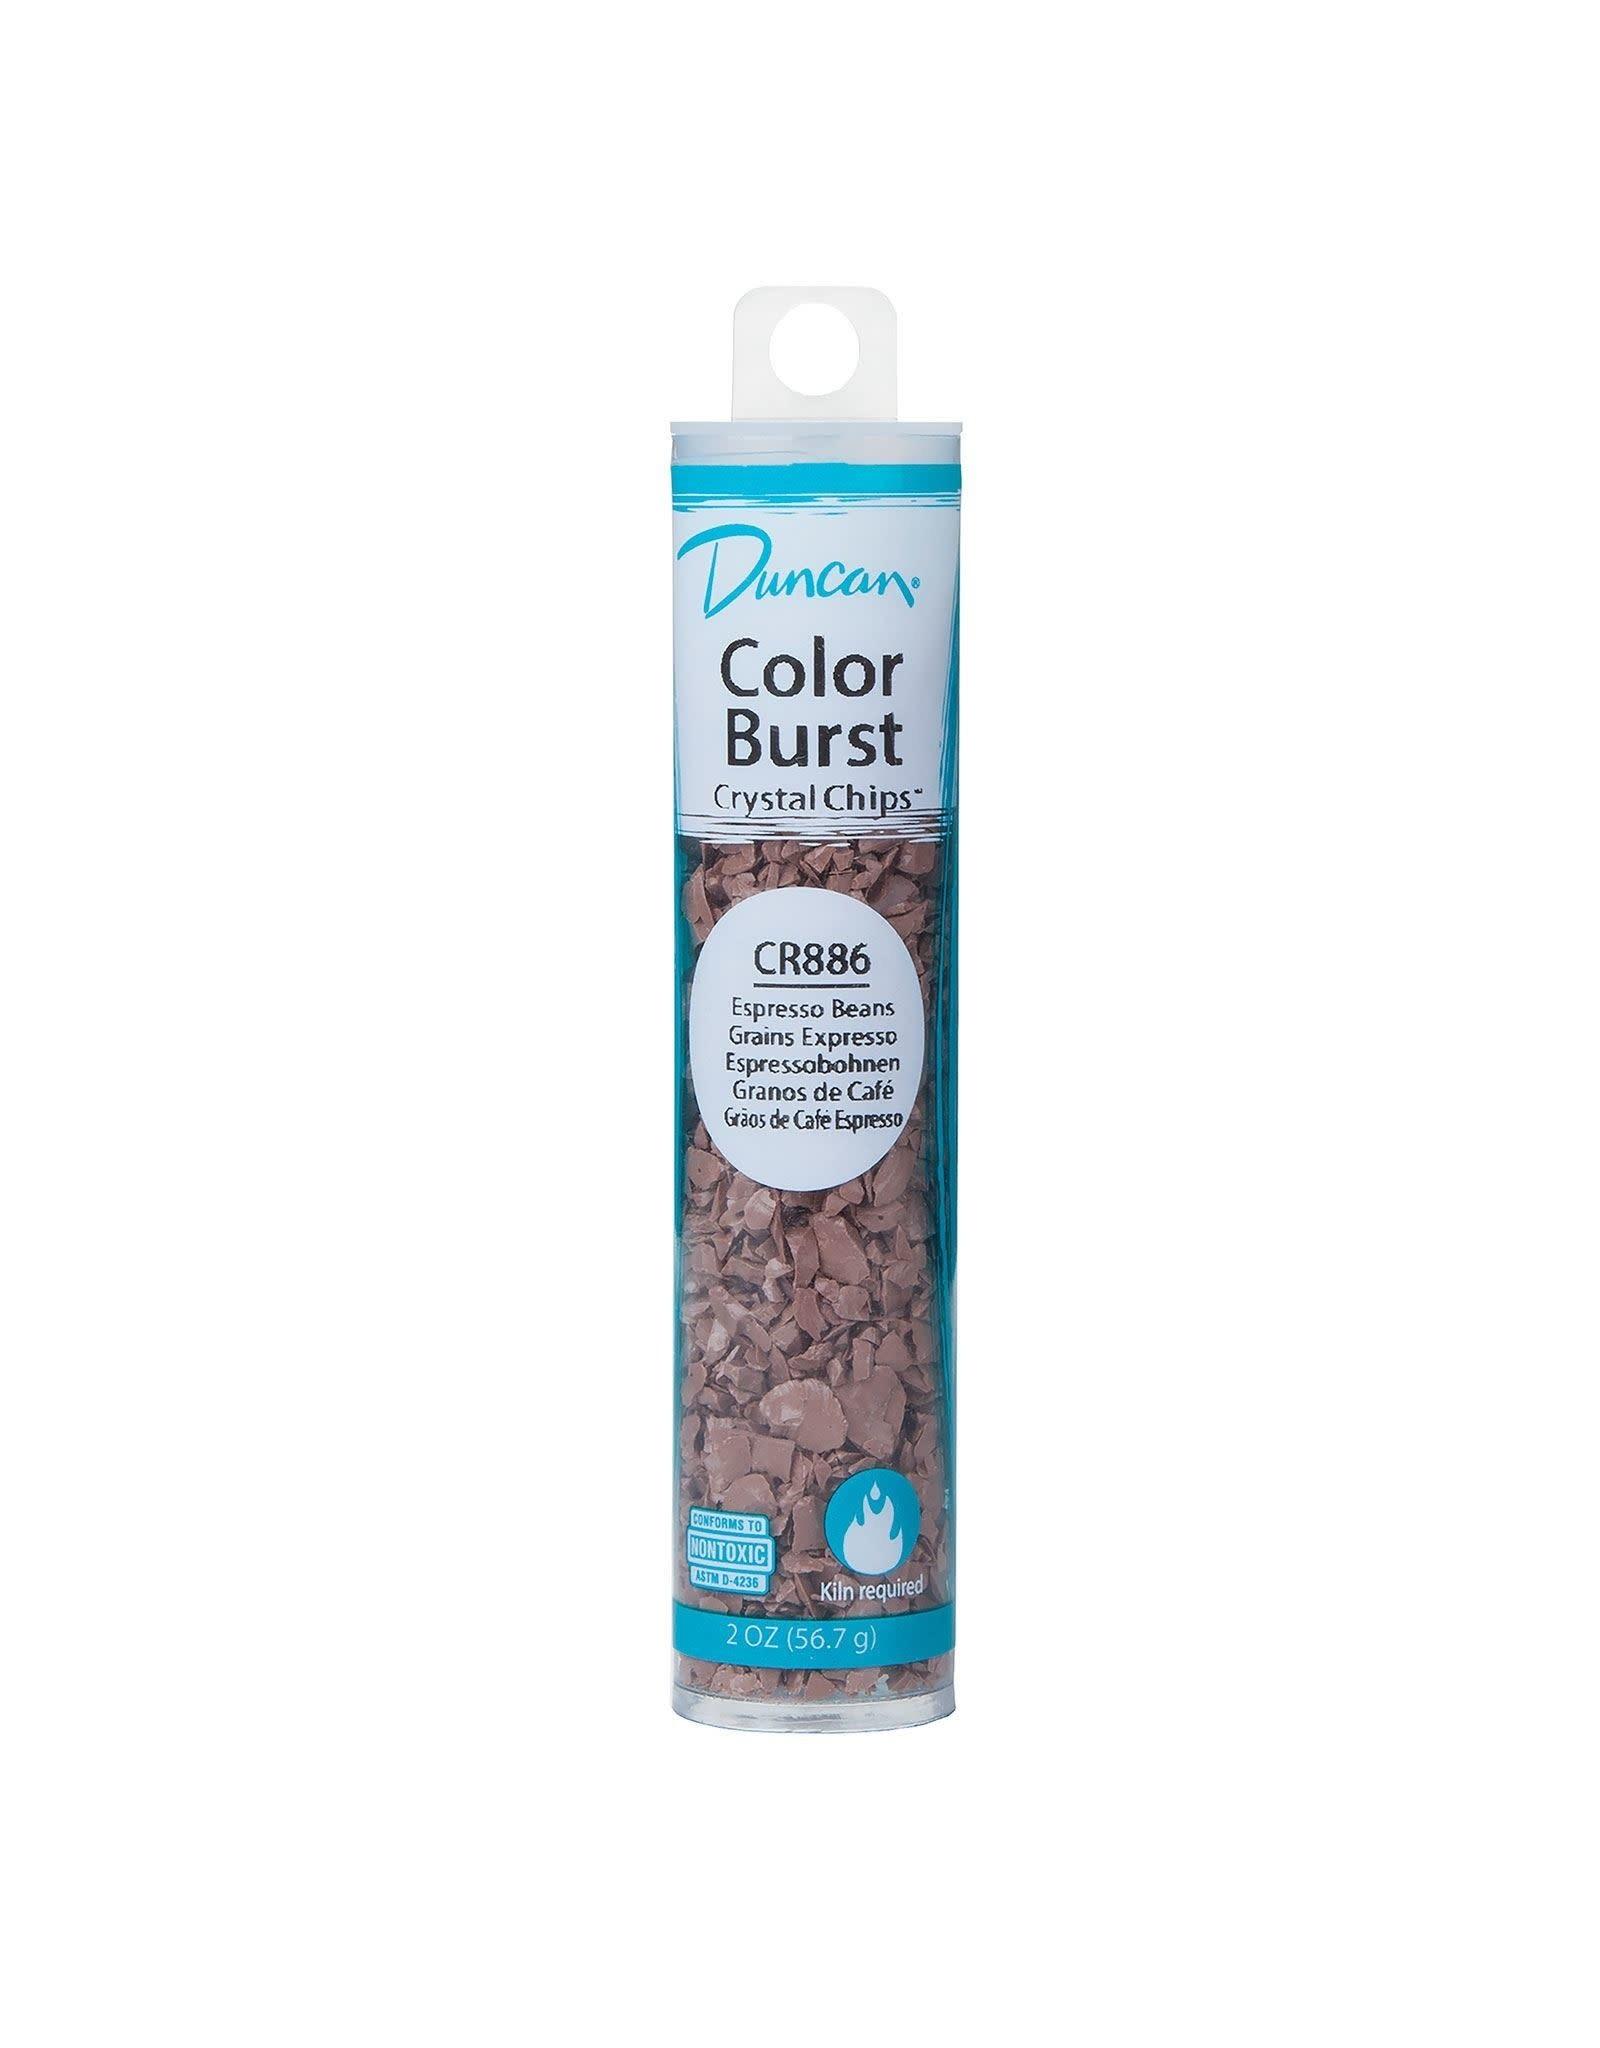 Duncan Espresso Beans Colour Burst Crystal Chips